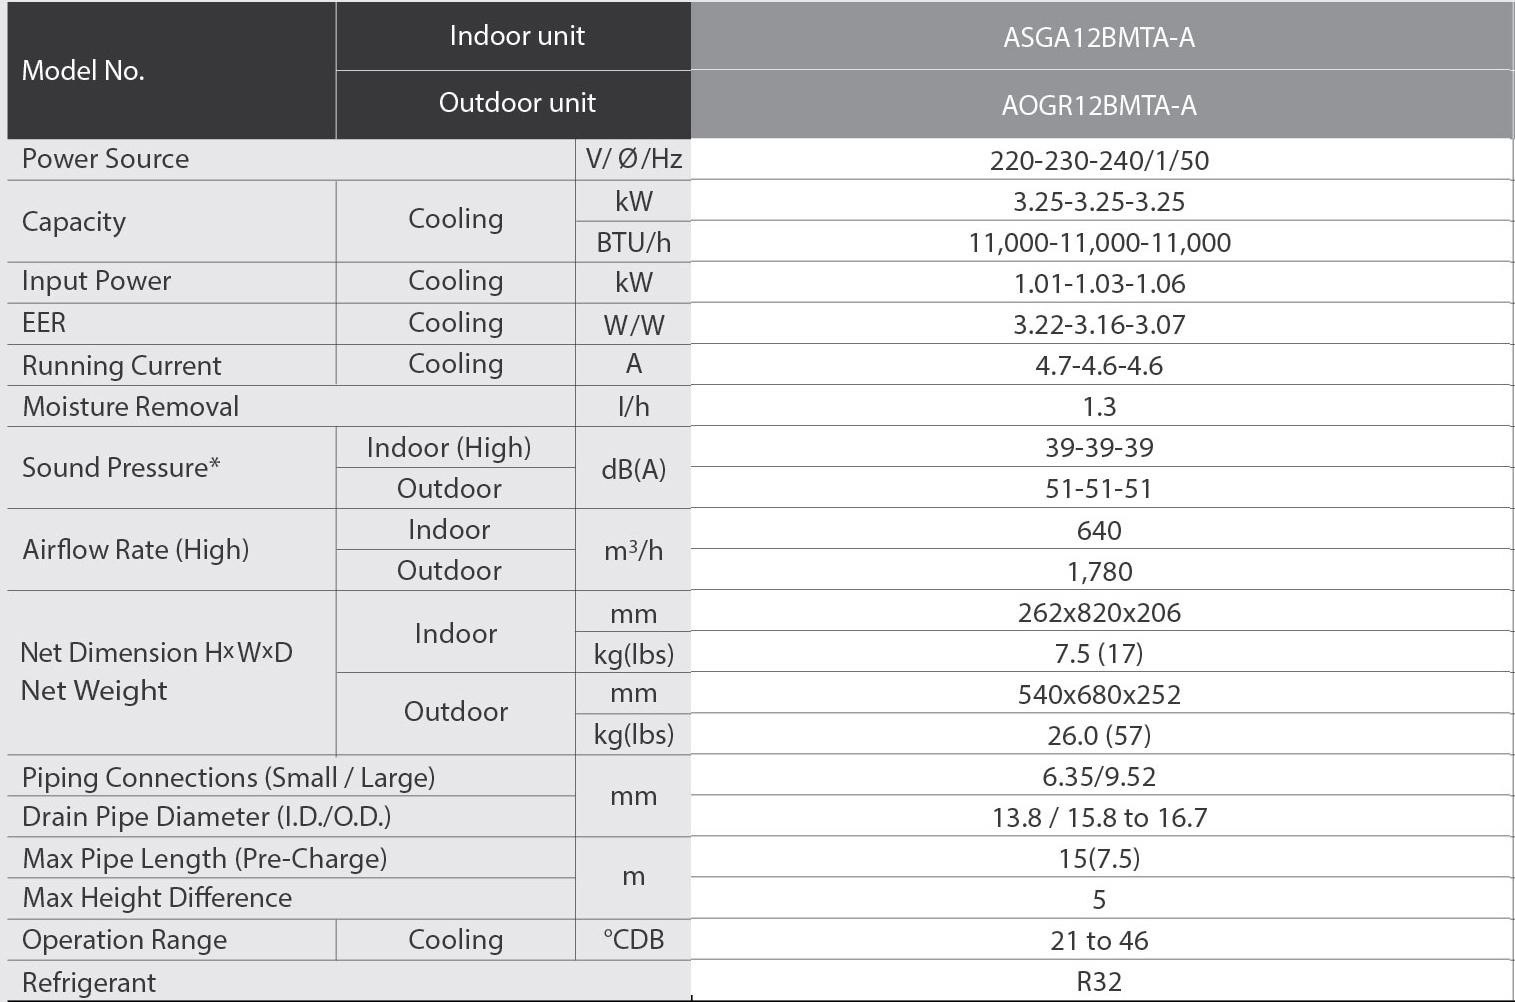 General Wall Mounted Air Conditioner Asga12bmta A 1 5hp